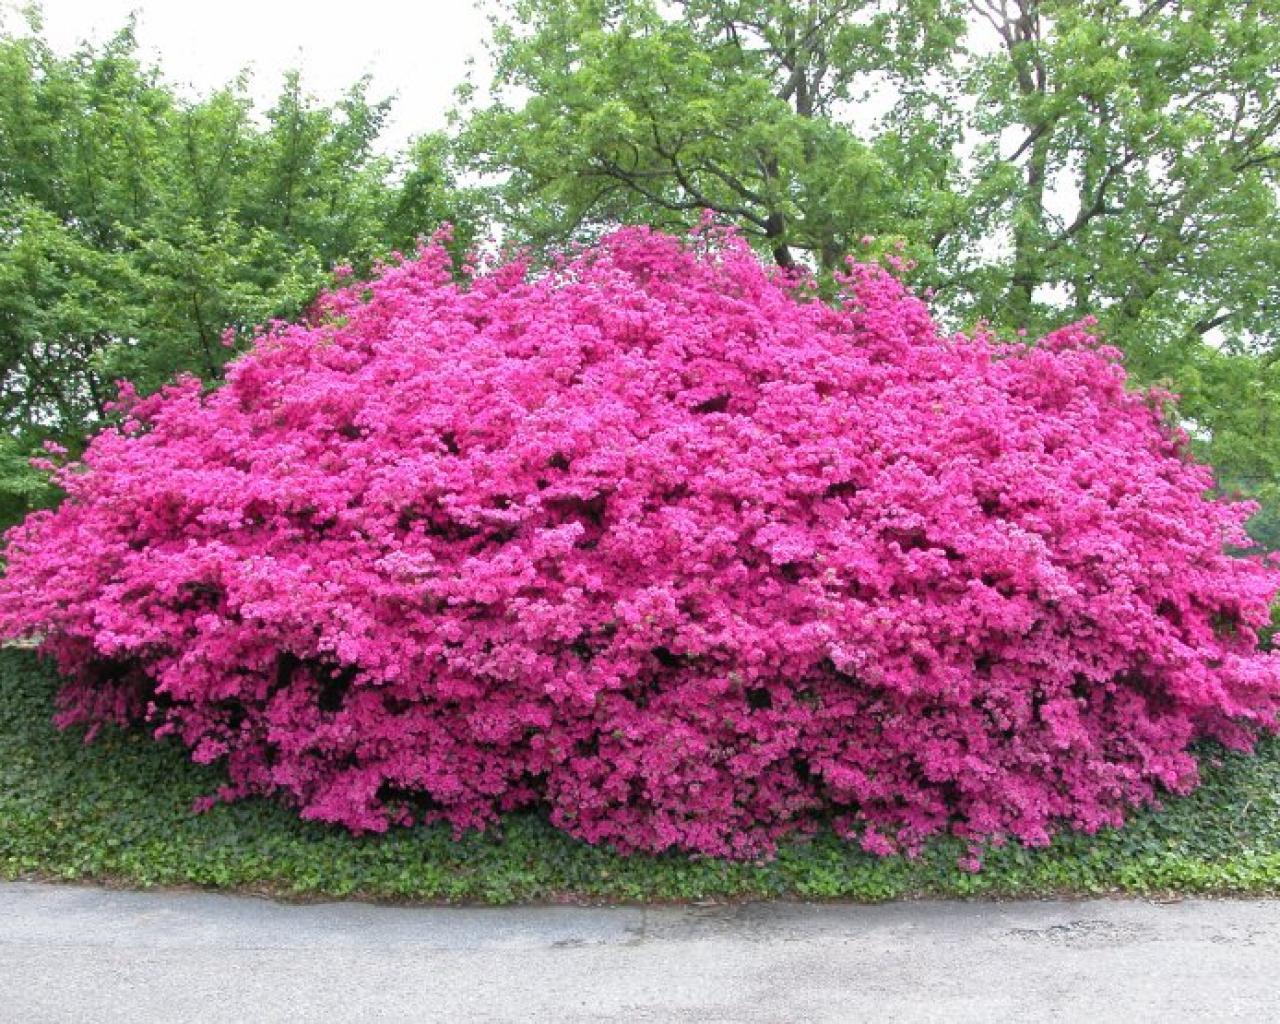 Photo of low growing shrubs